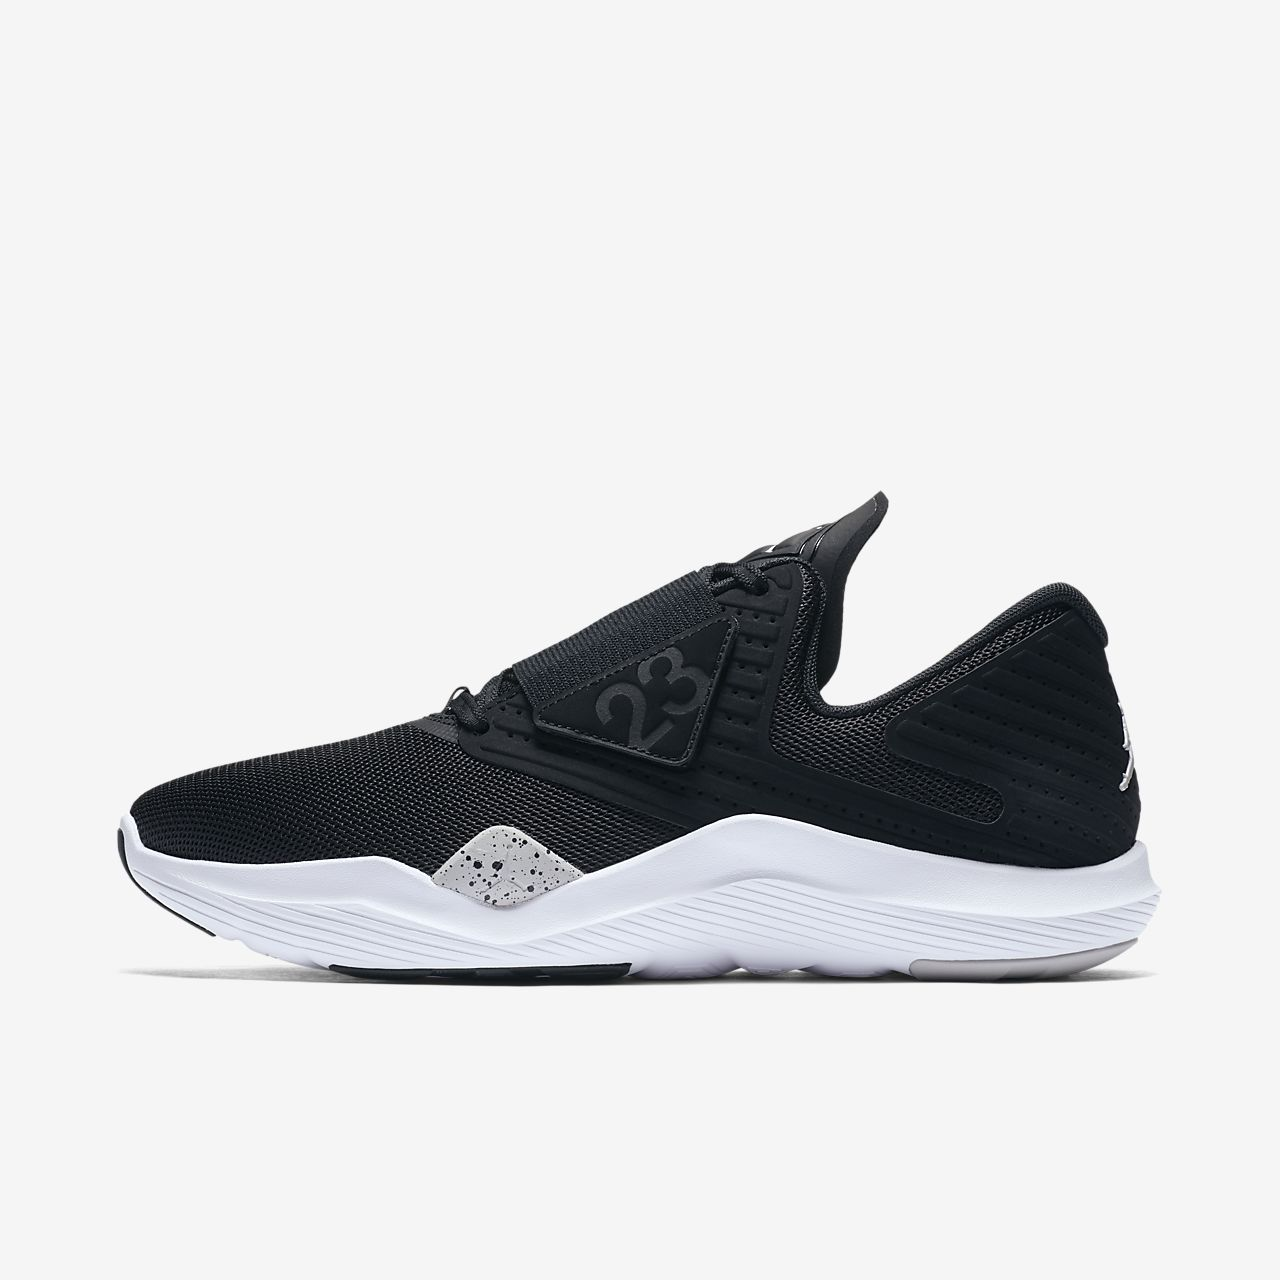 Nike Jordan Relentless Black White Tech Grey Men Training Shoes AJ7990004